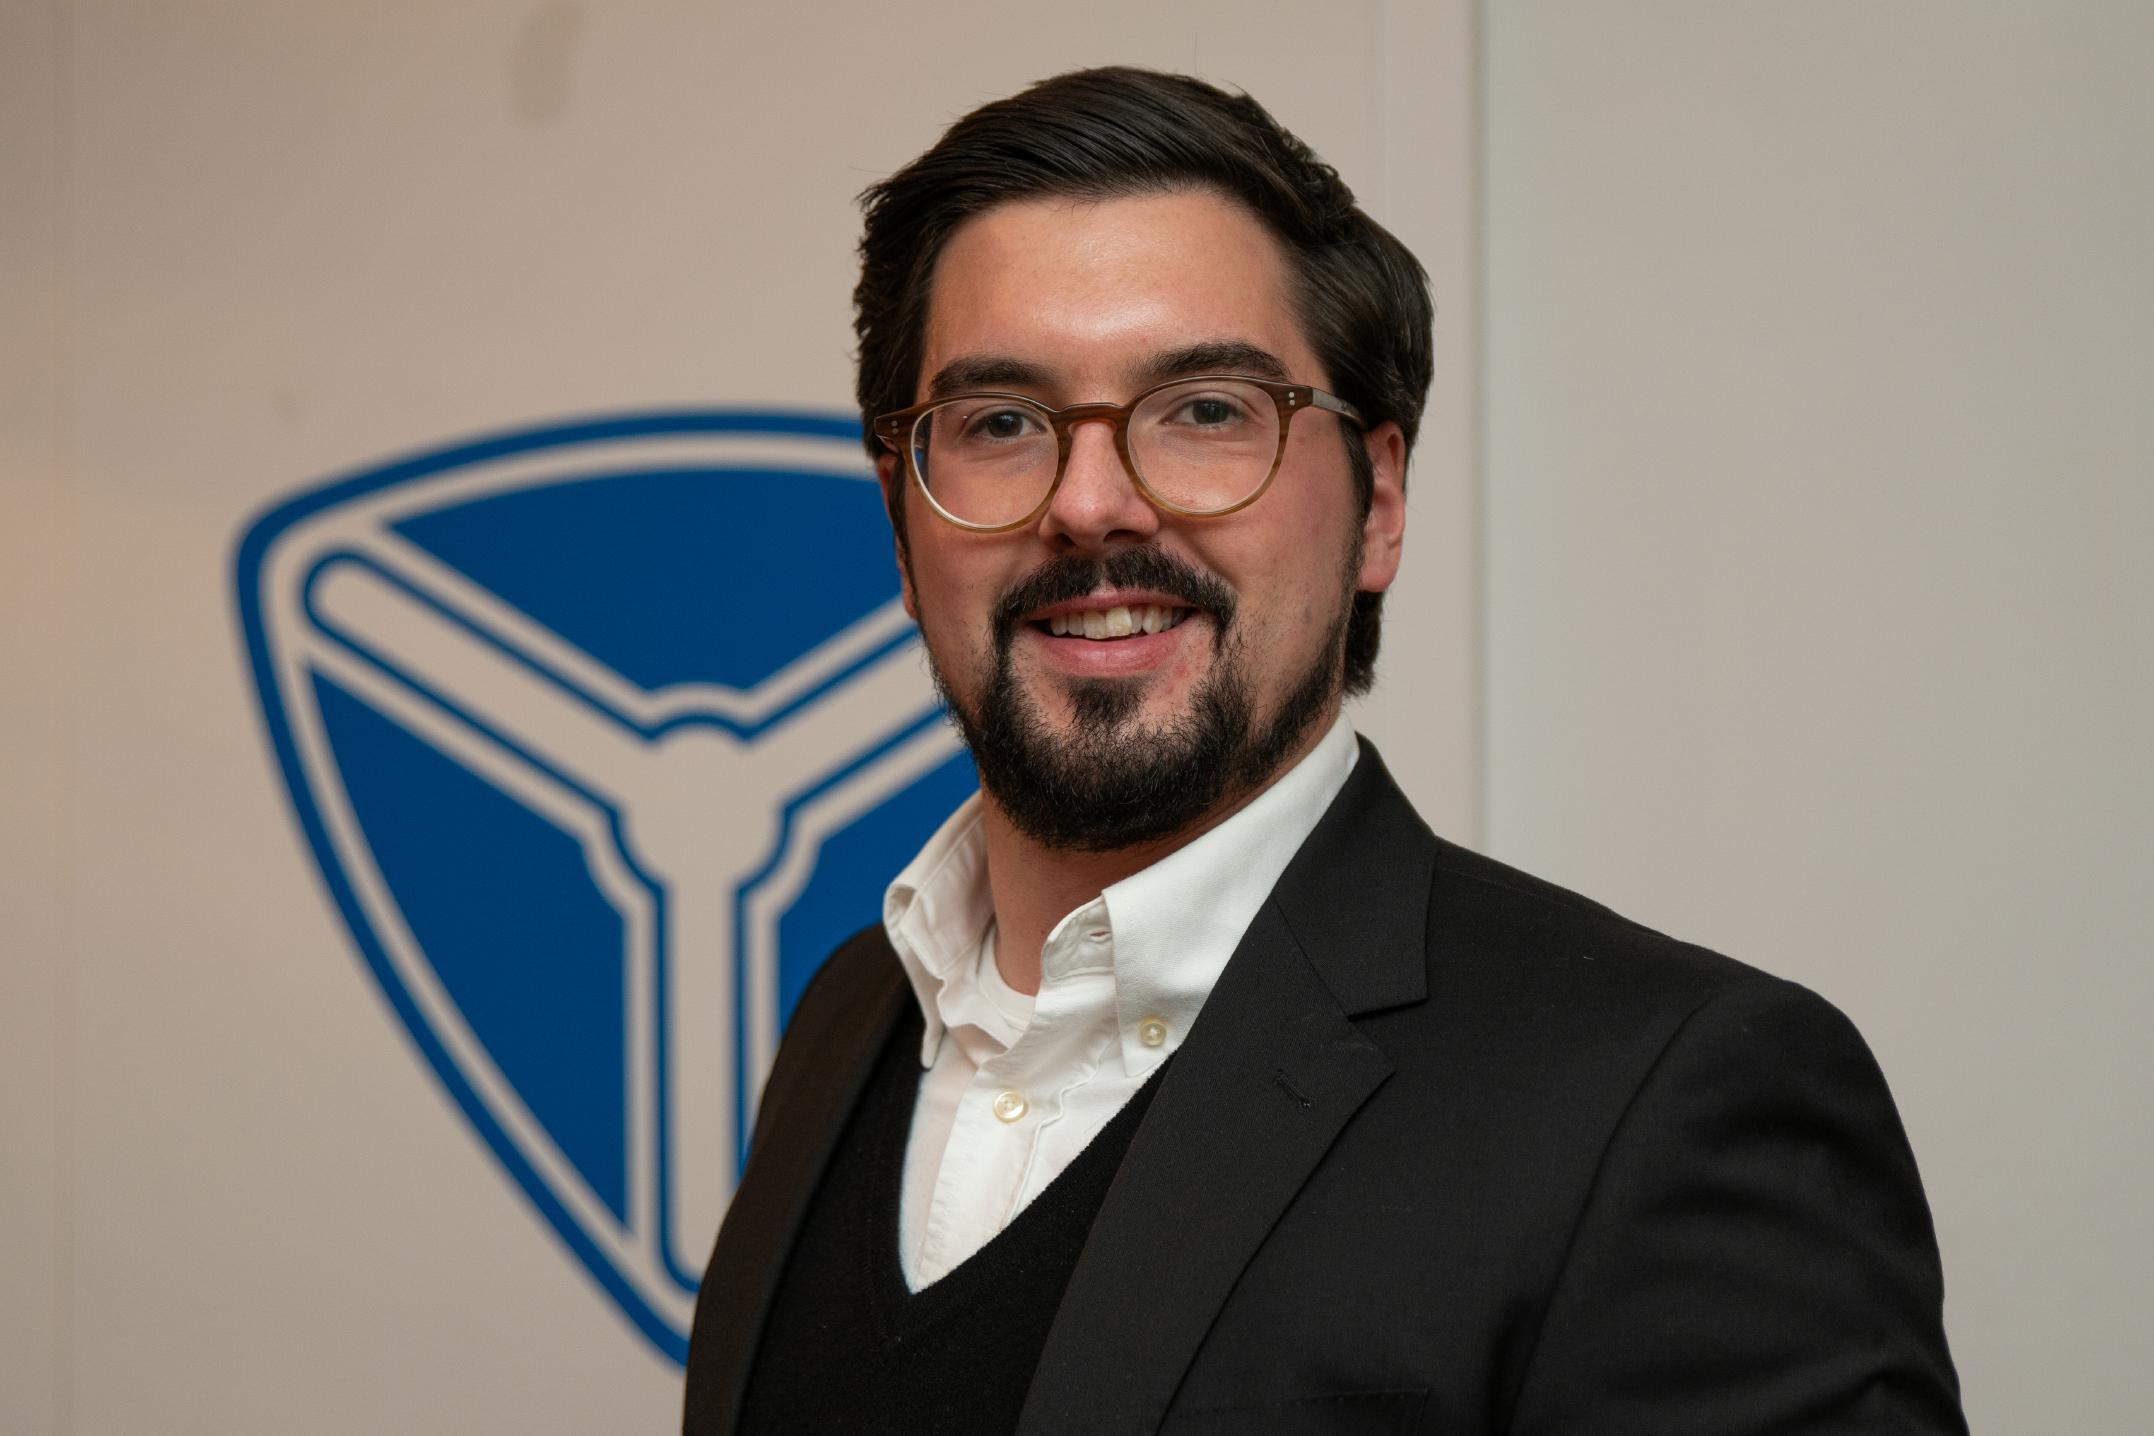 Julian Friedrich Beirat TTK Tobtaubenklub Sachsenwald Wohltorf